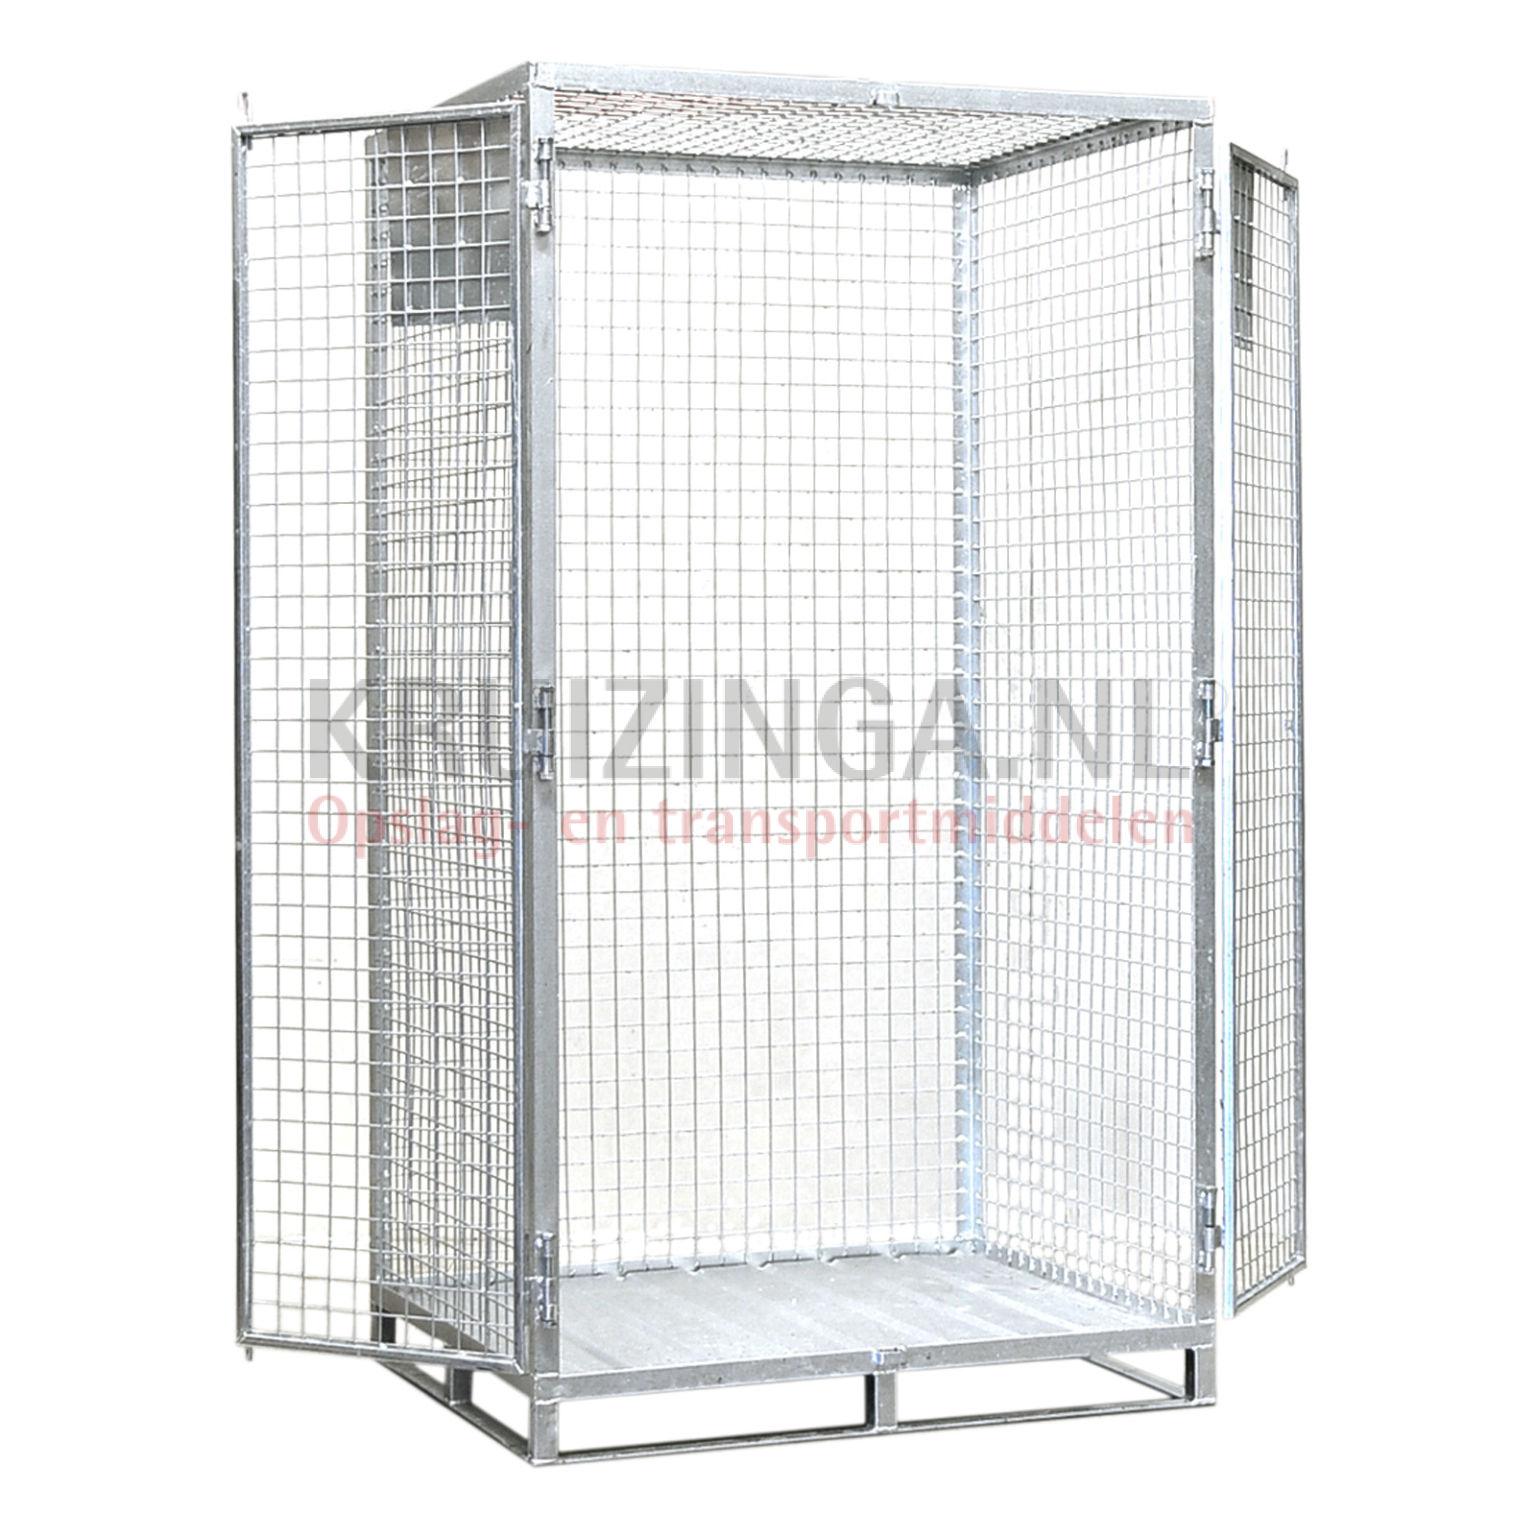 gitterbox anti diebstahl 2 t ren ab 495 50 frei haus. Black Bedroom Furniture Sets. Home Design Ideas